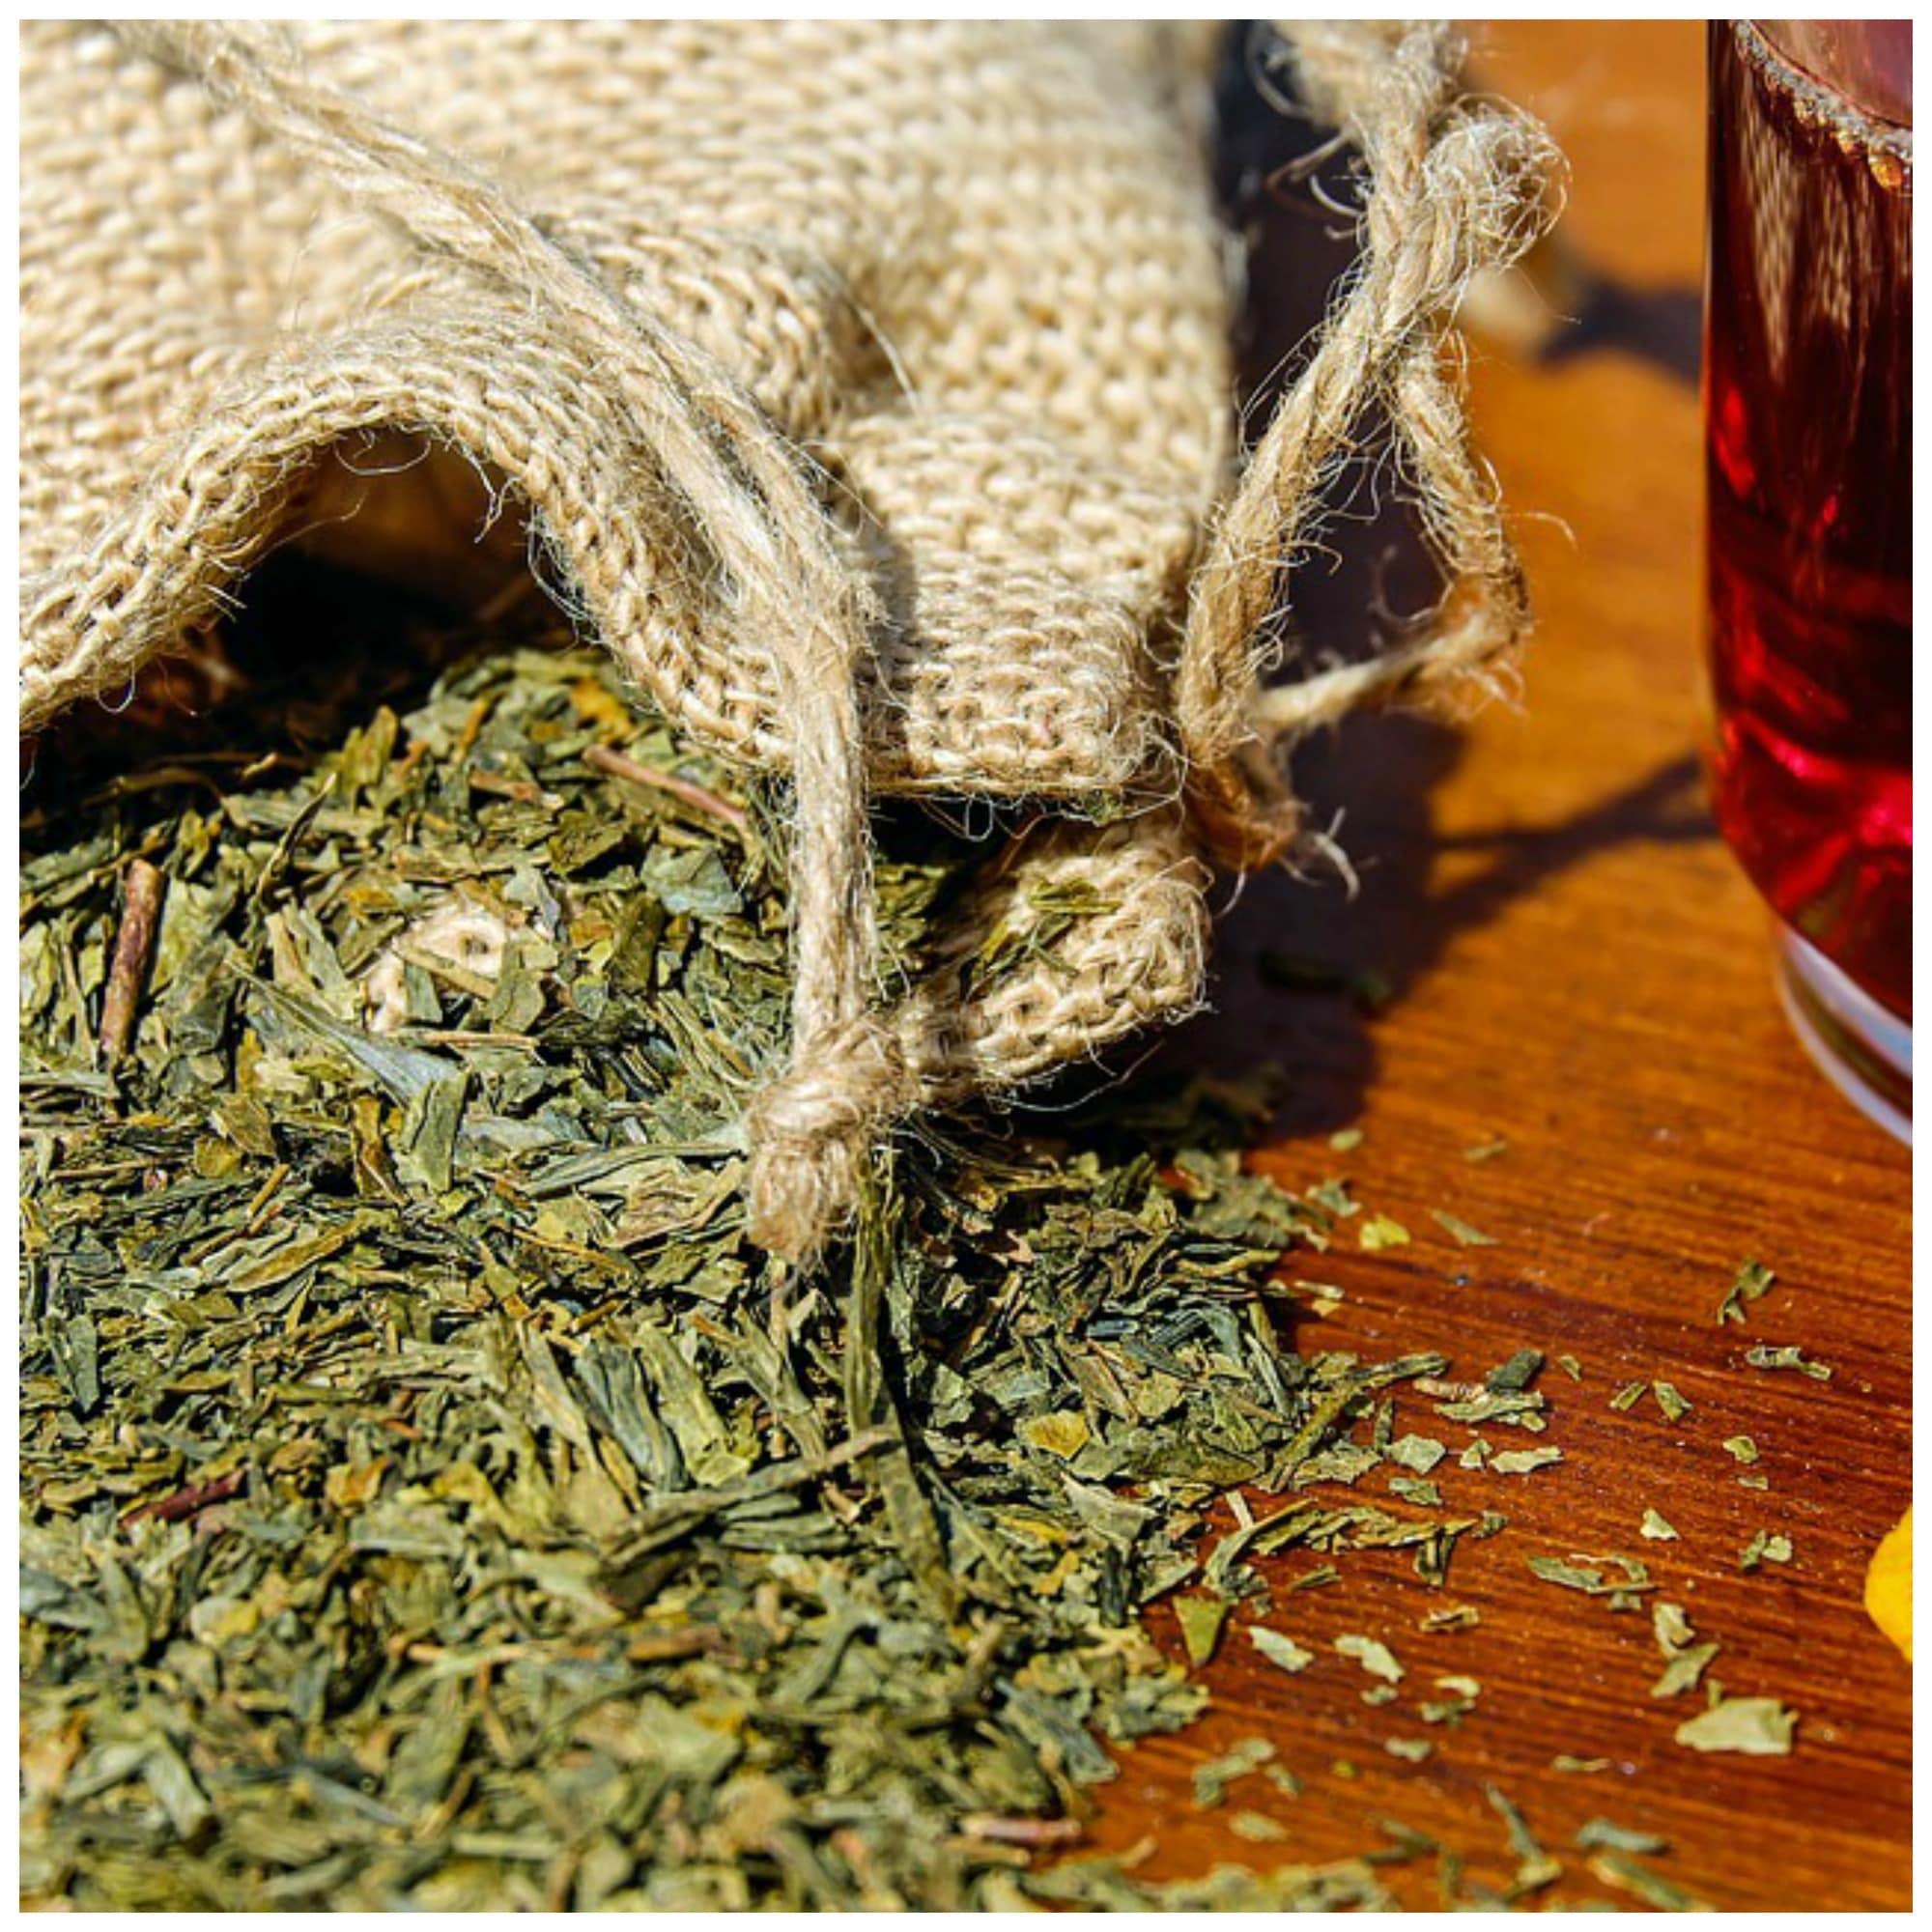 Cancer cure essiac herbal tea - Cancer Cure Essiac Herbal Tea 79